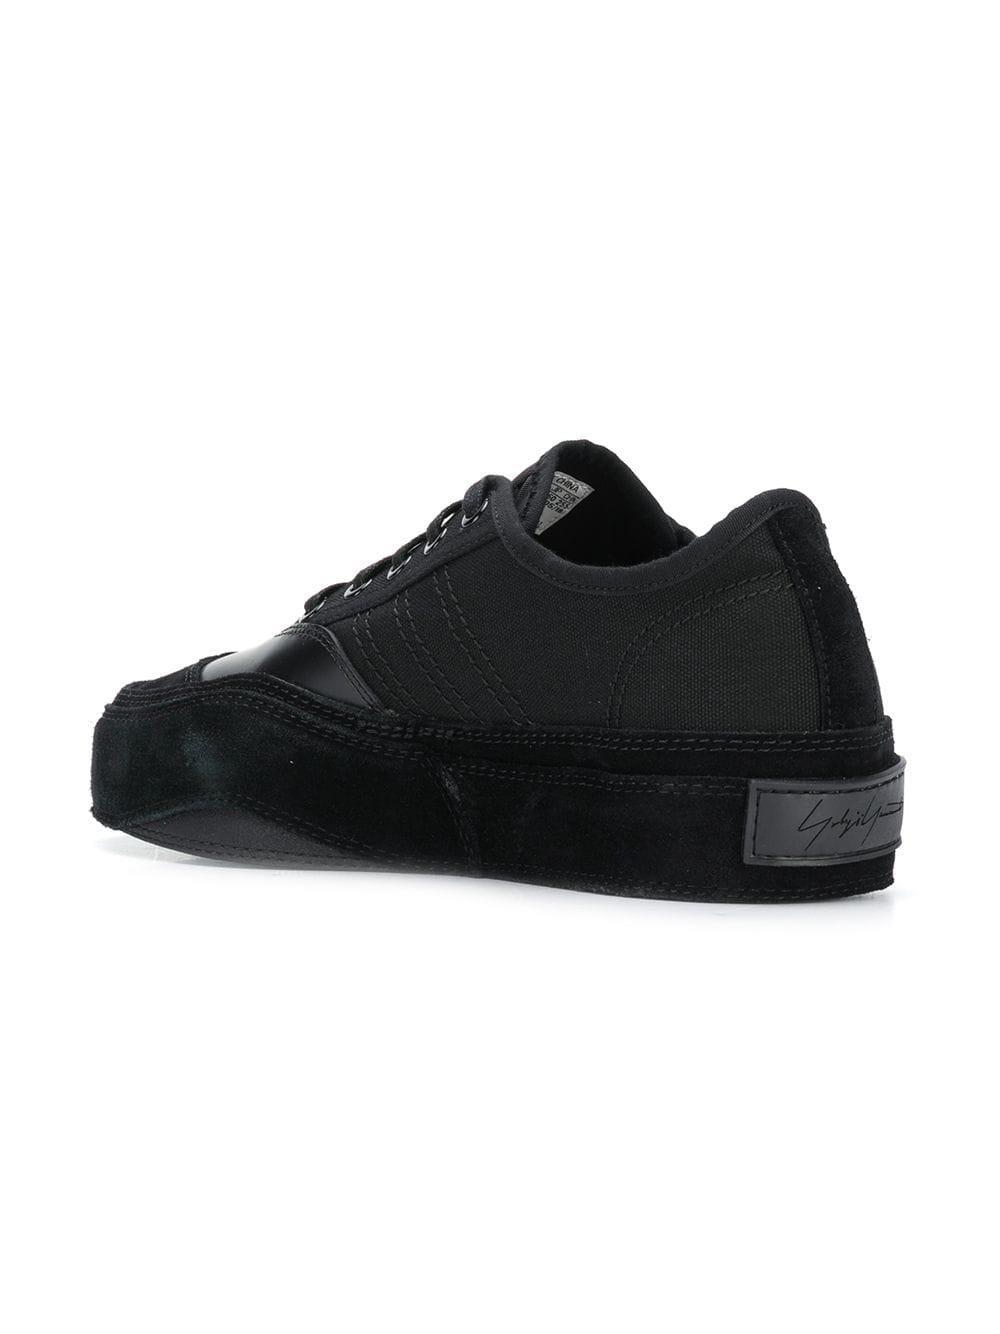 1dc119ed6 Yohji Yamamoto - Black X Adidas Contrast Logo Sneakers for Men - Lyst. View  fullscreen